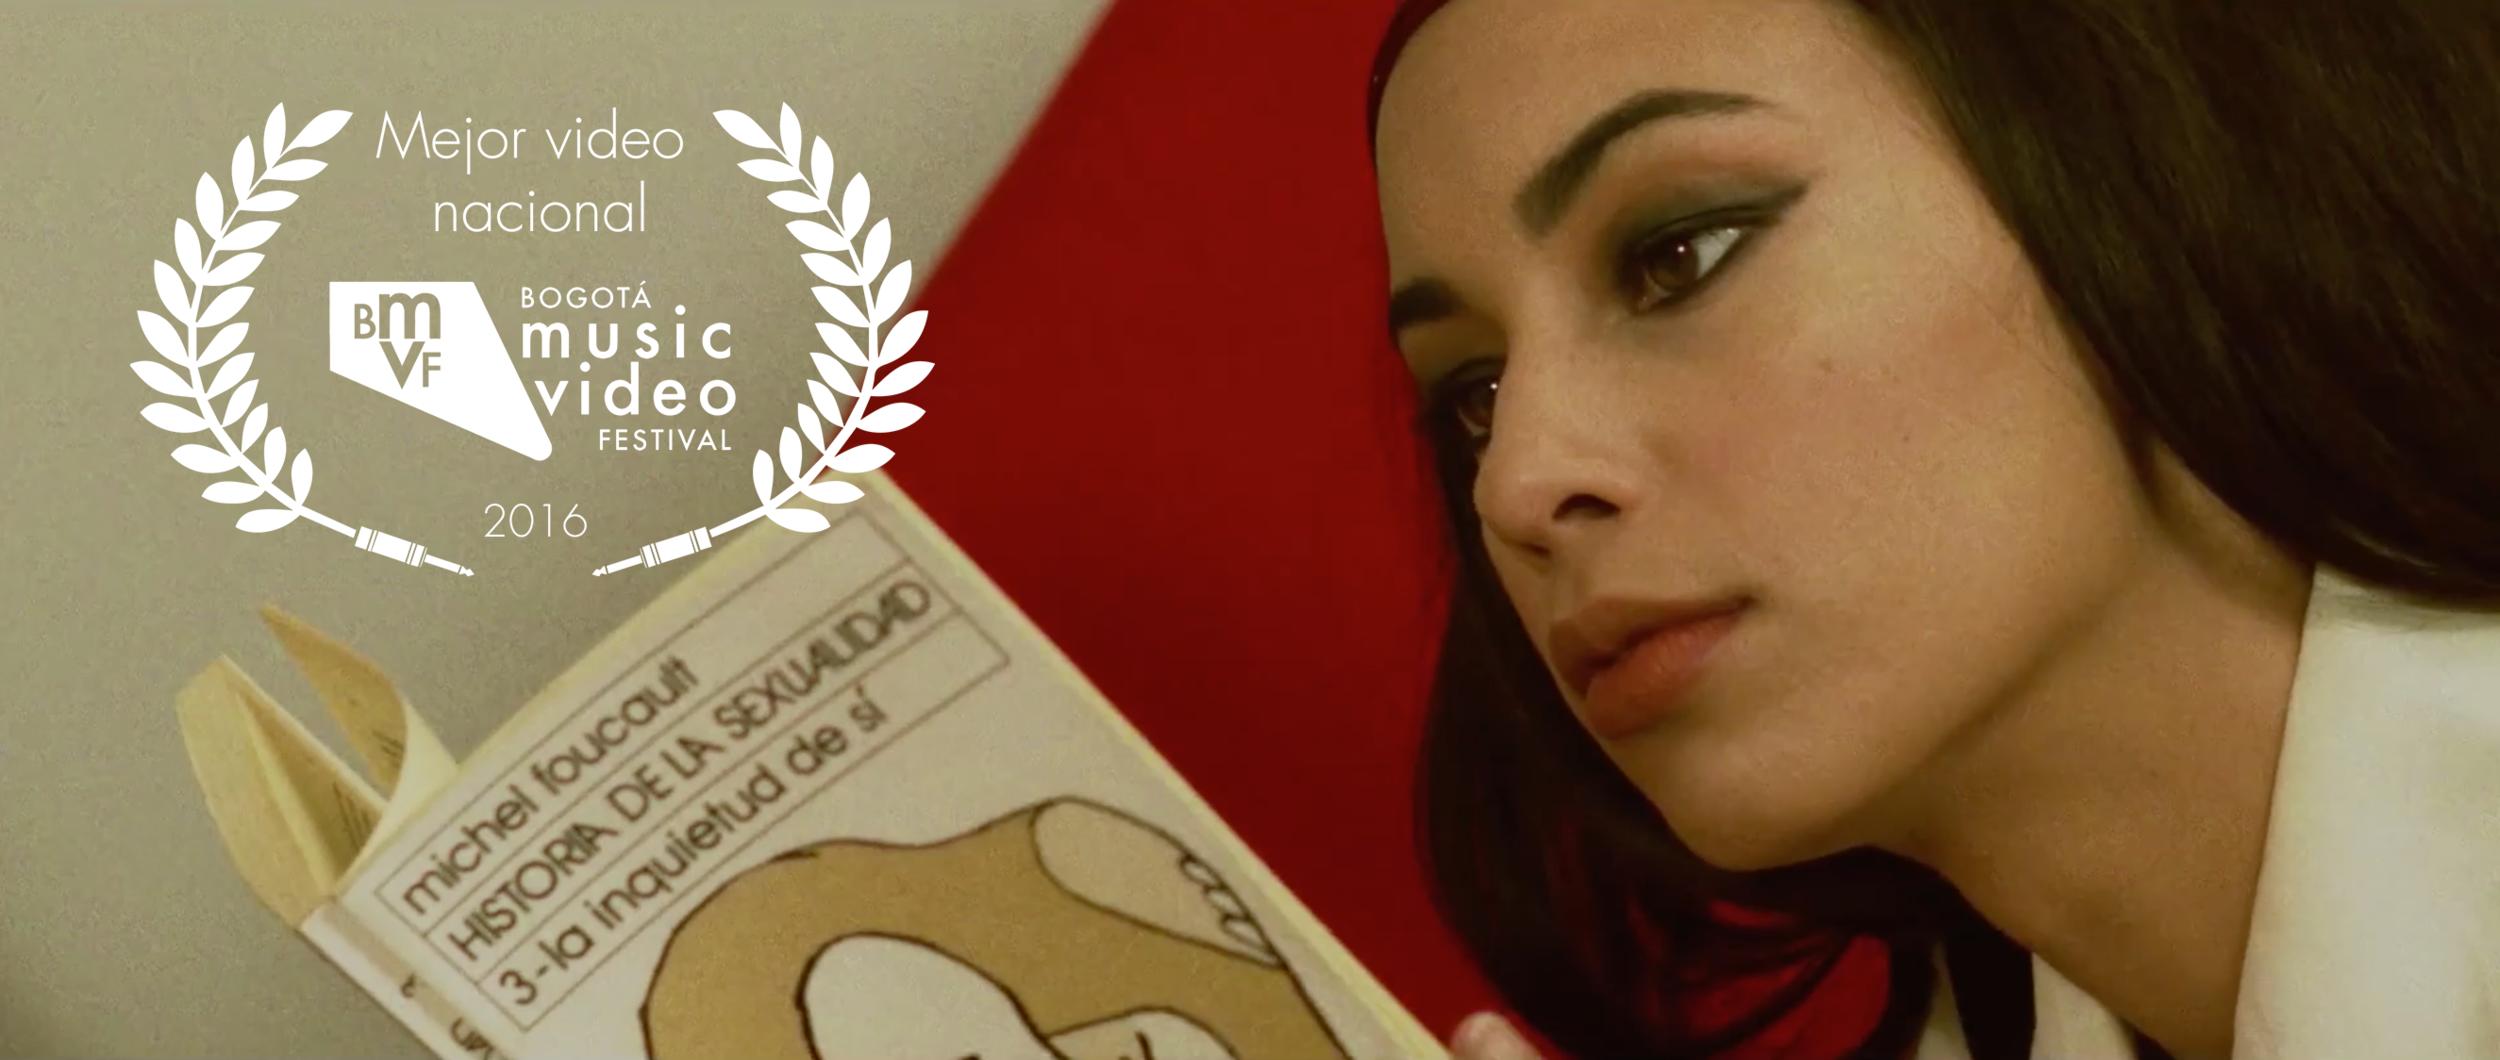 Copy of winner - best music video